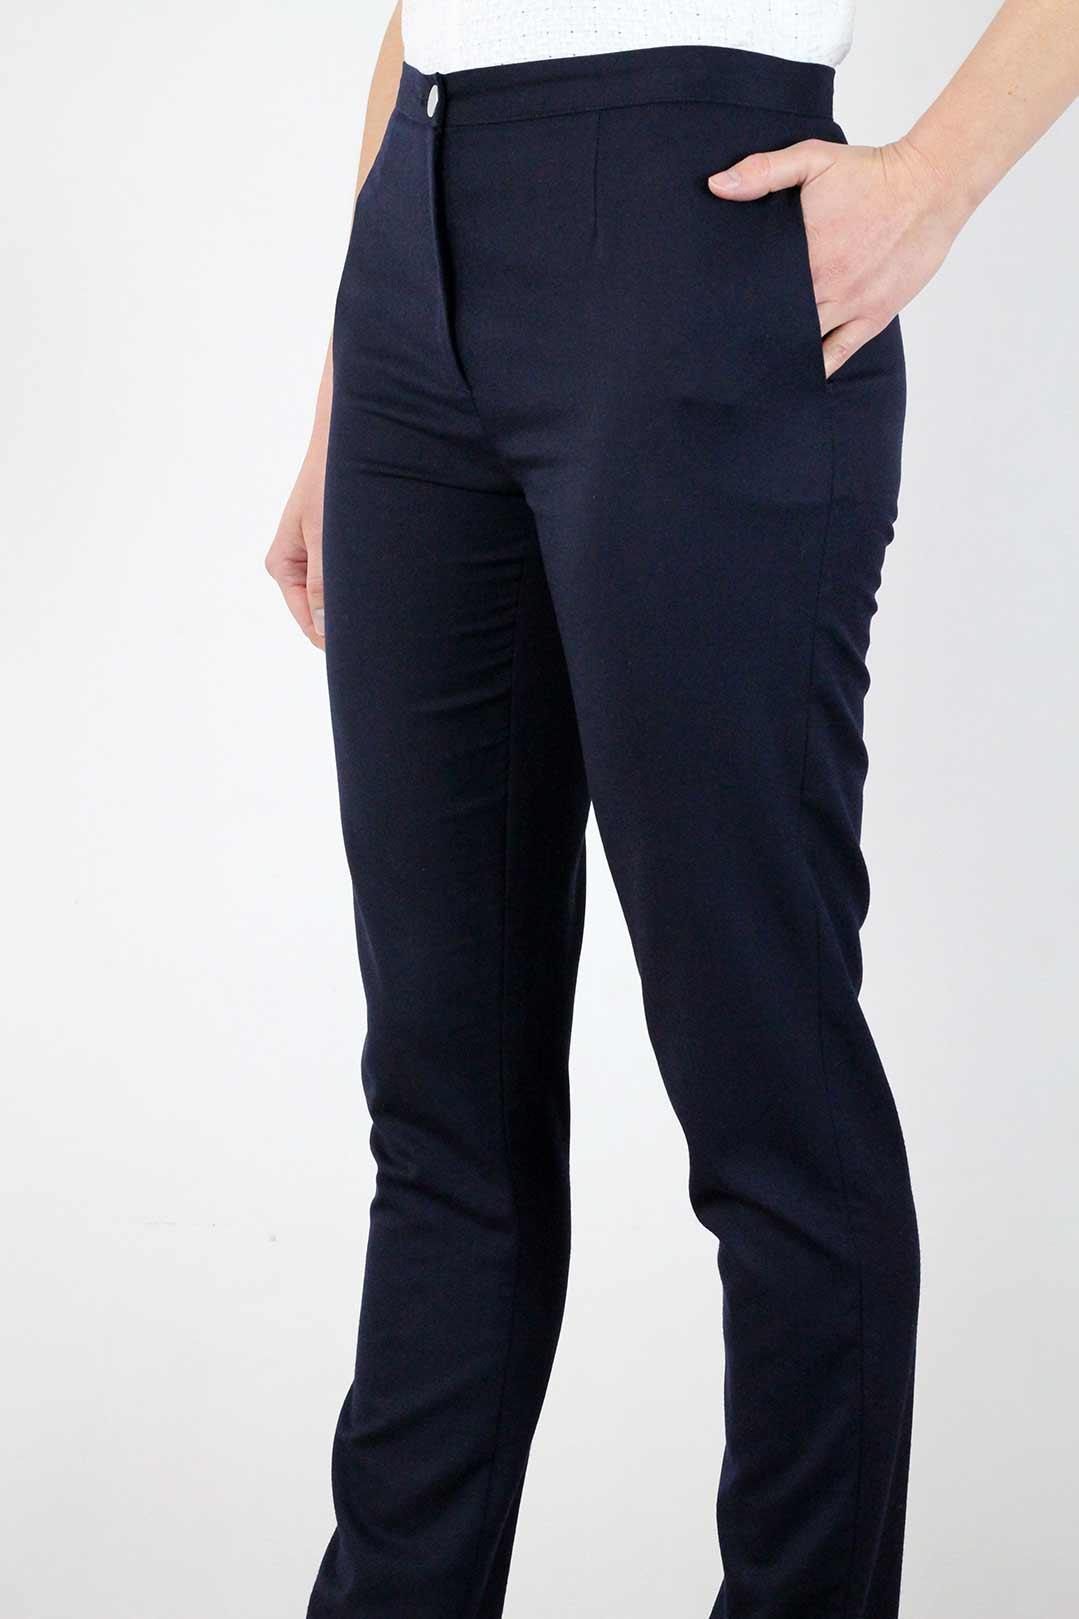 pantalon tailleur femme bleu marine 1